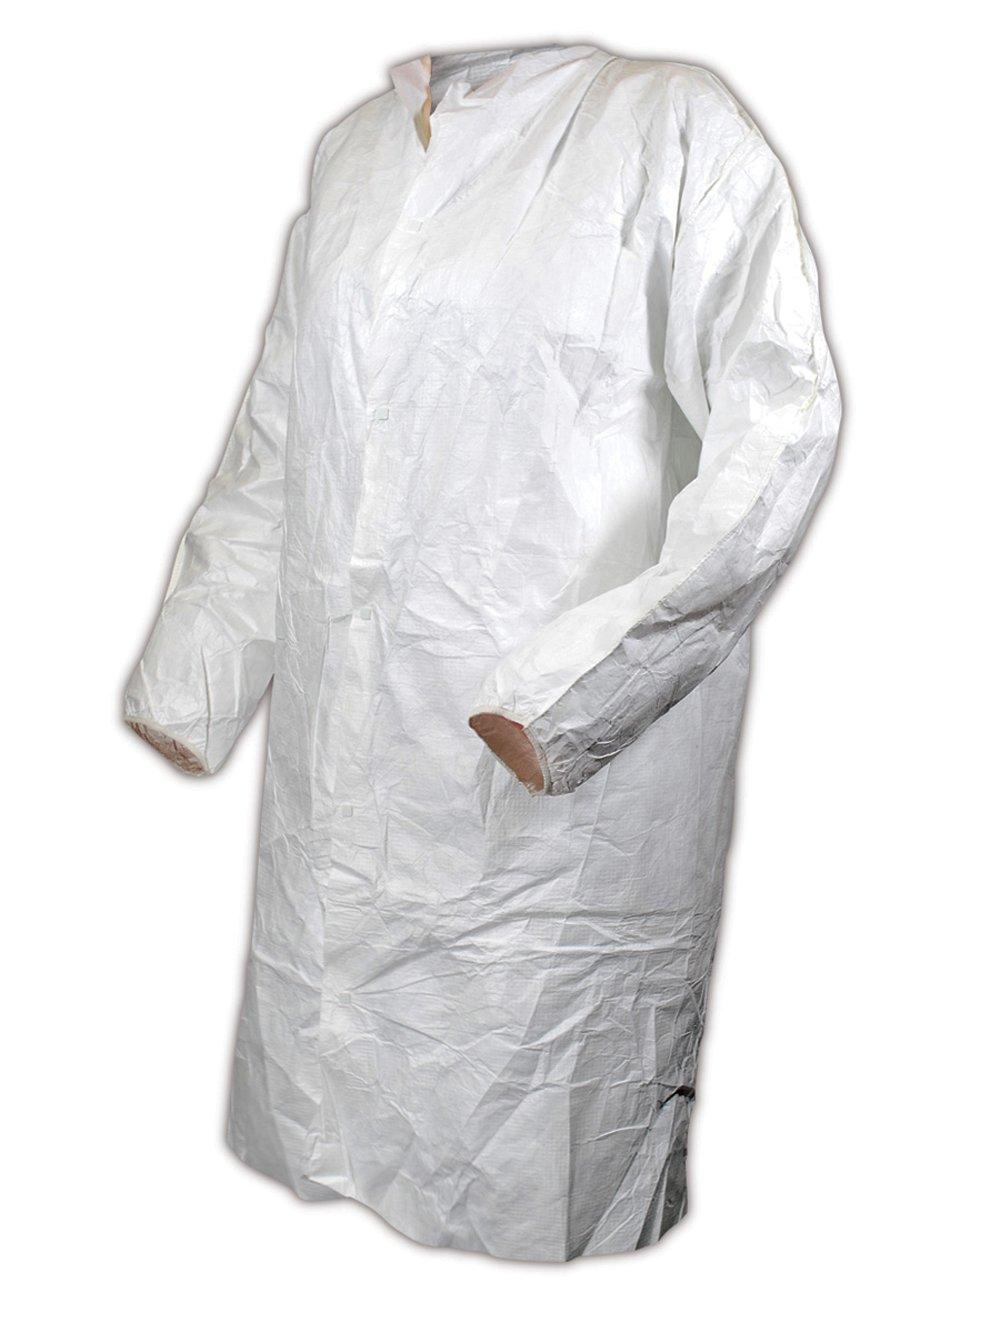 Magid CC111XXL EconoWear Tyvek Disposable Lab Coat, 2XL, White (Case of 30): Industrial & Scientific